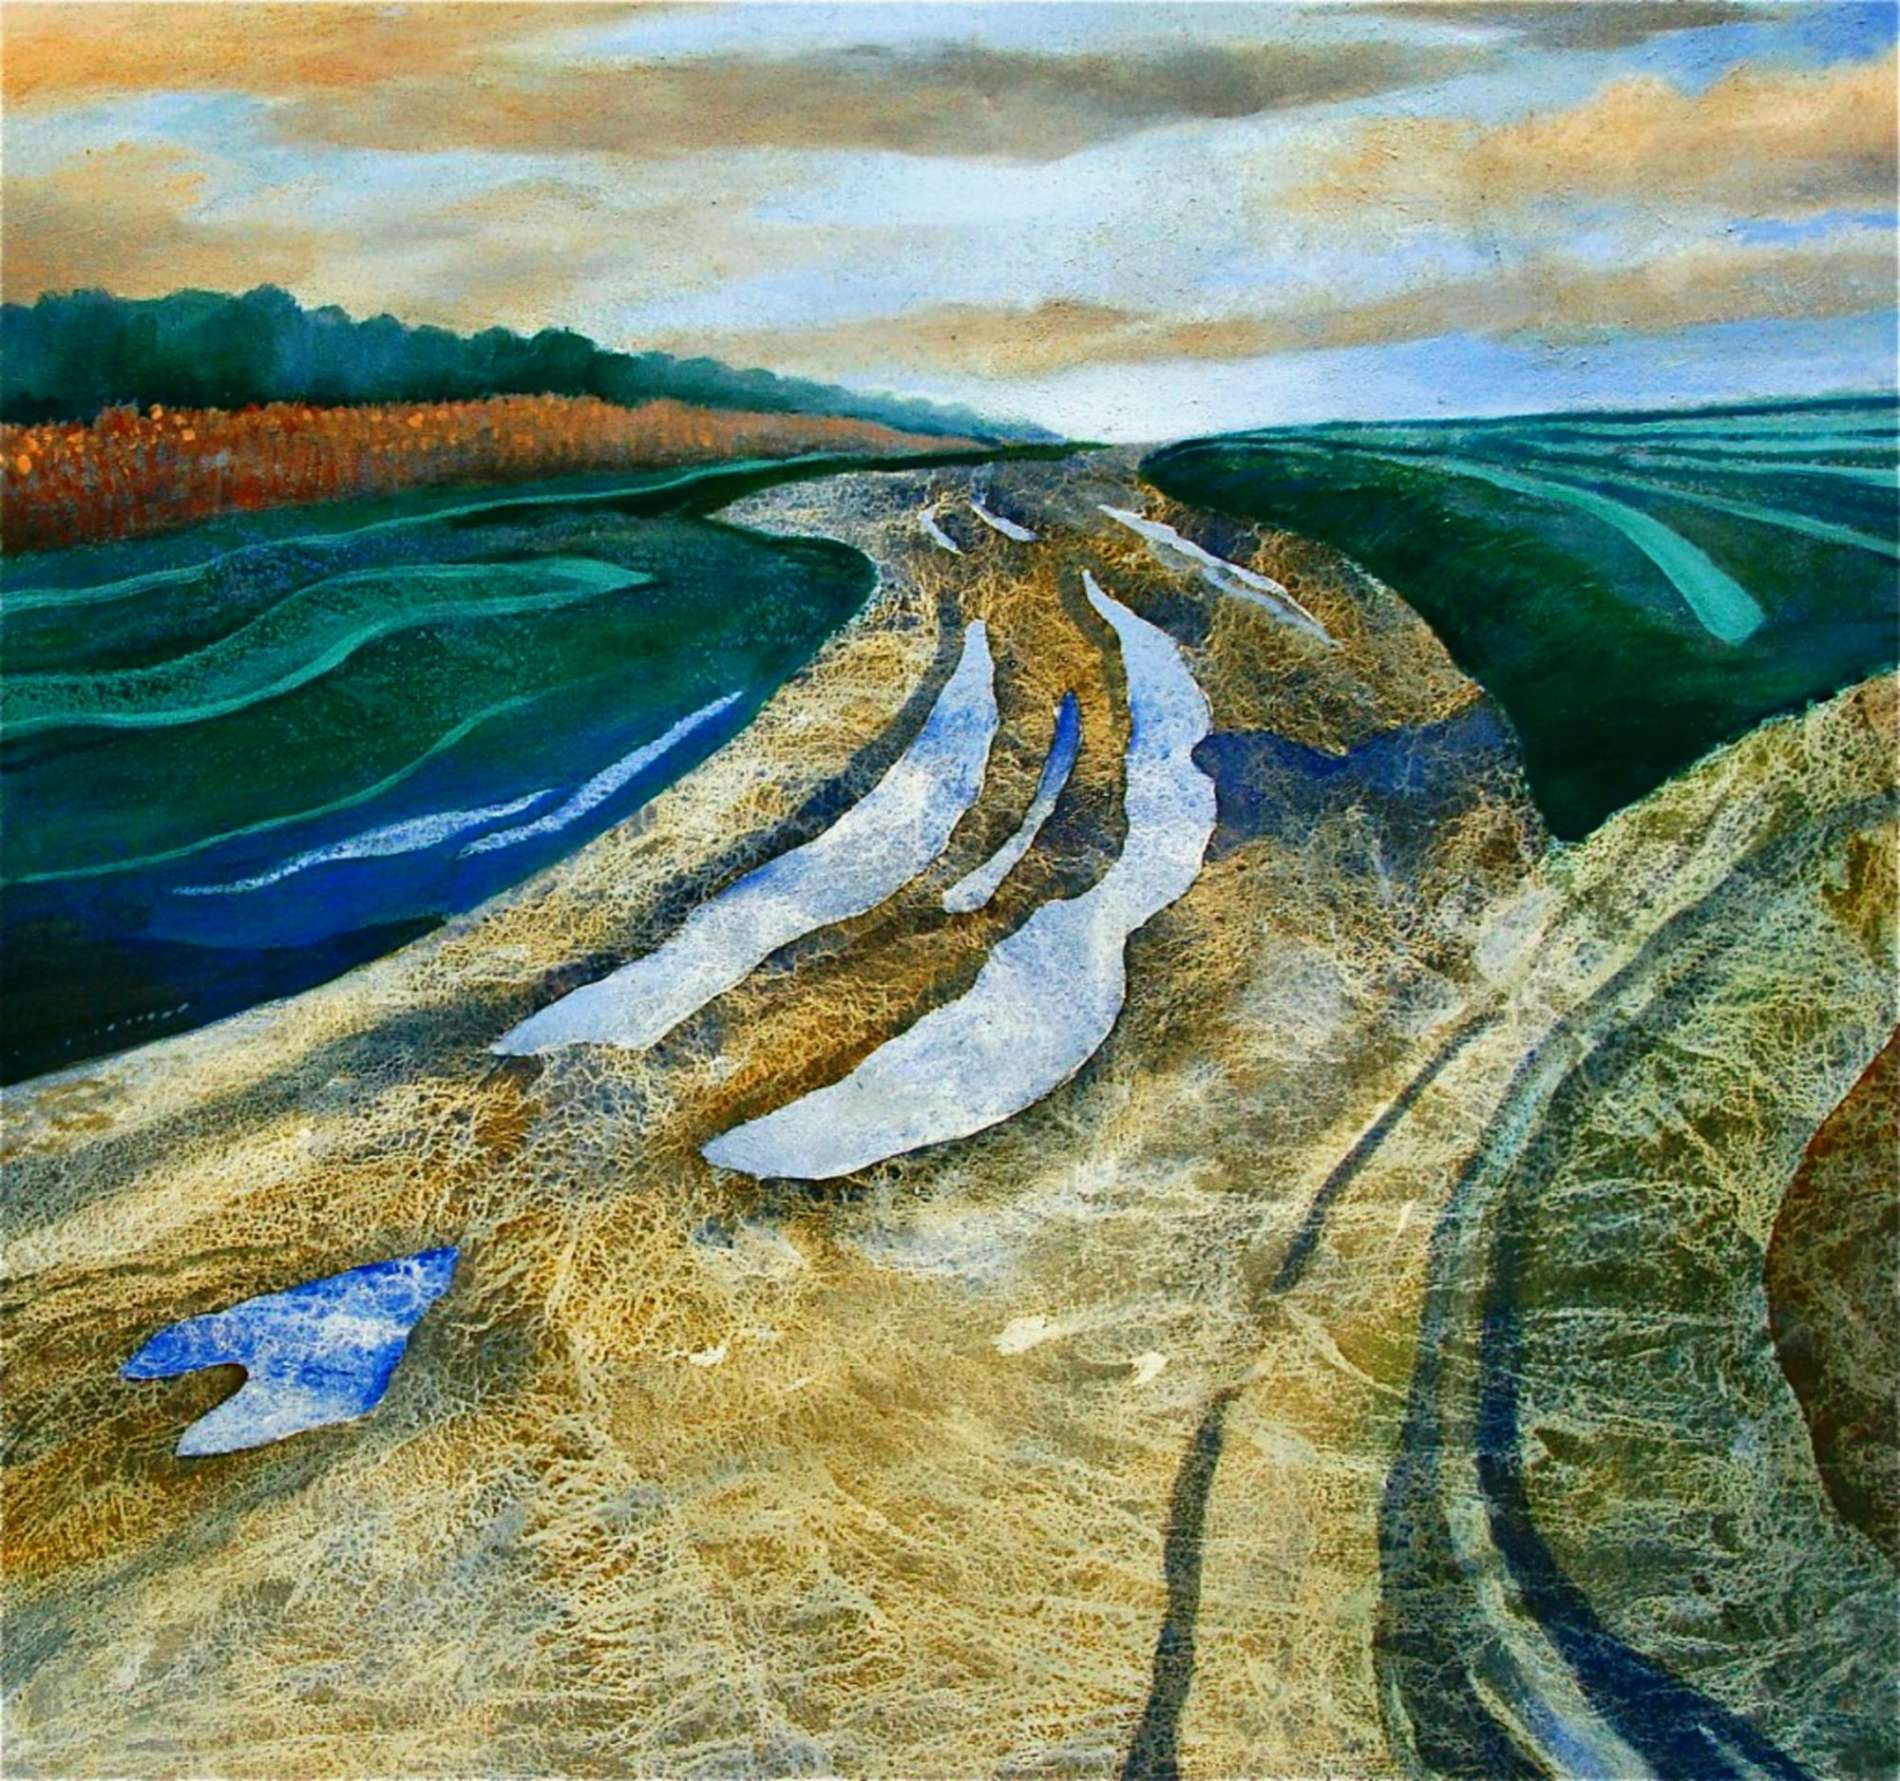 Zand, modder